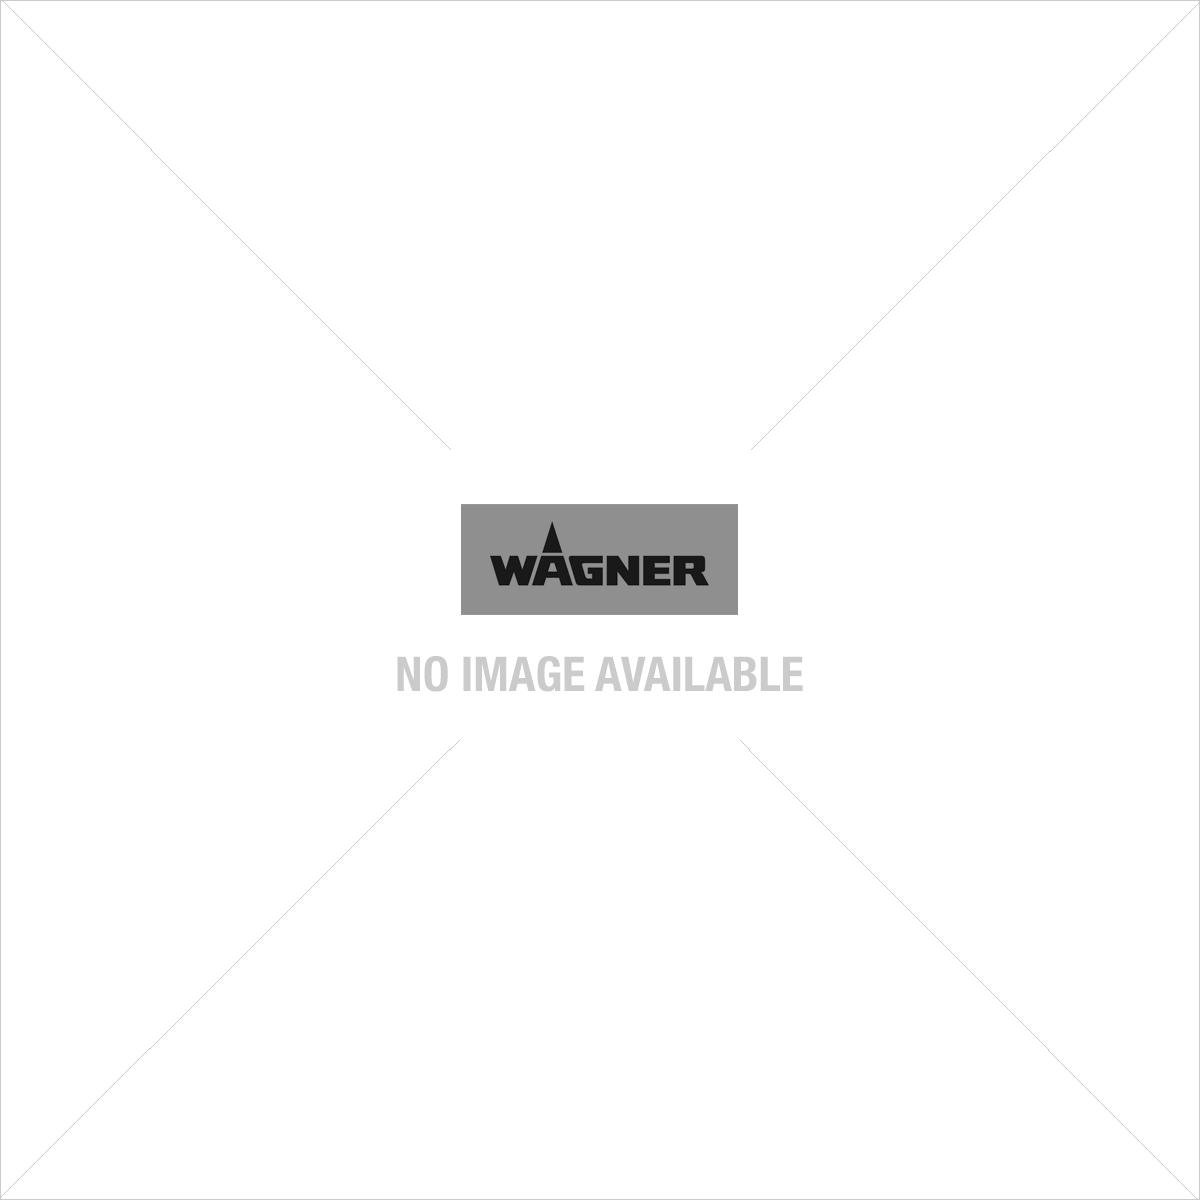 Wagner cupliner